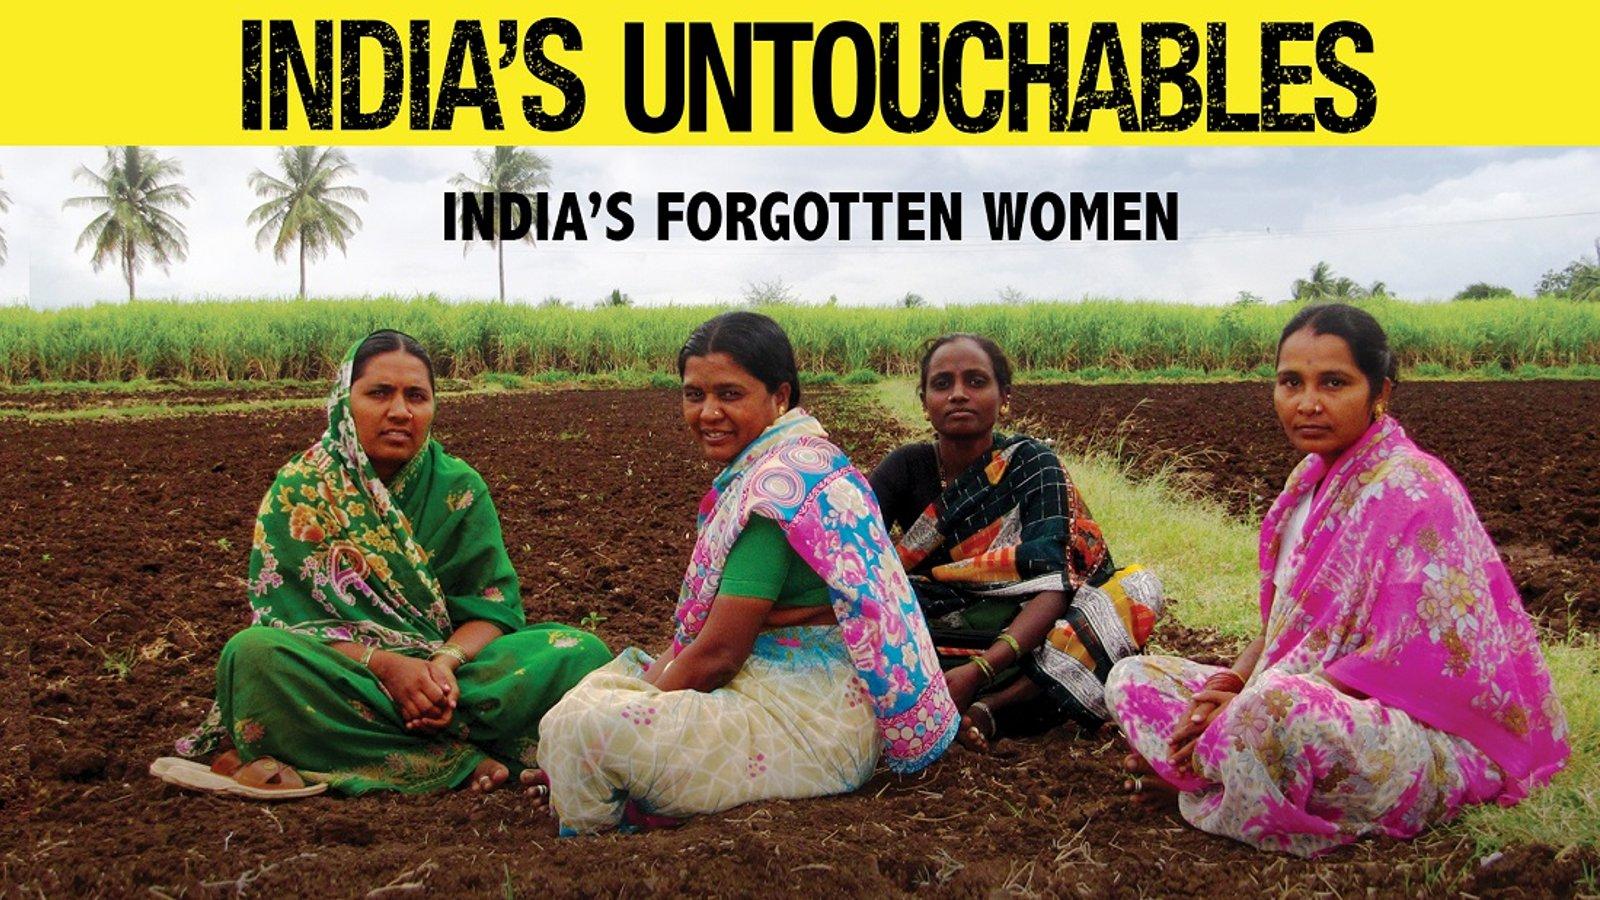 India's Forgotten Women (Untouchables)